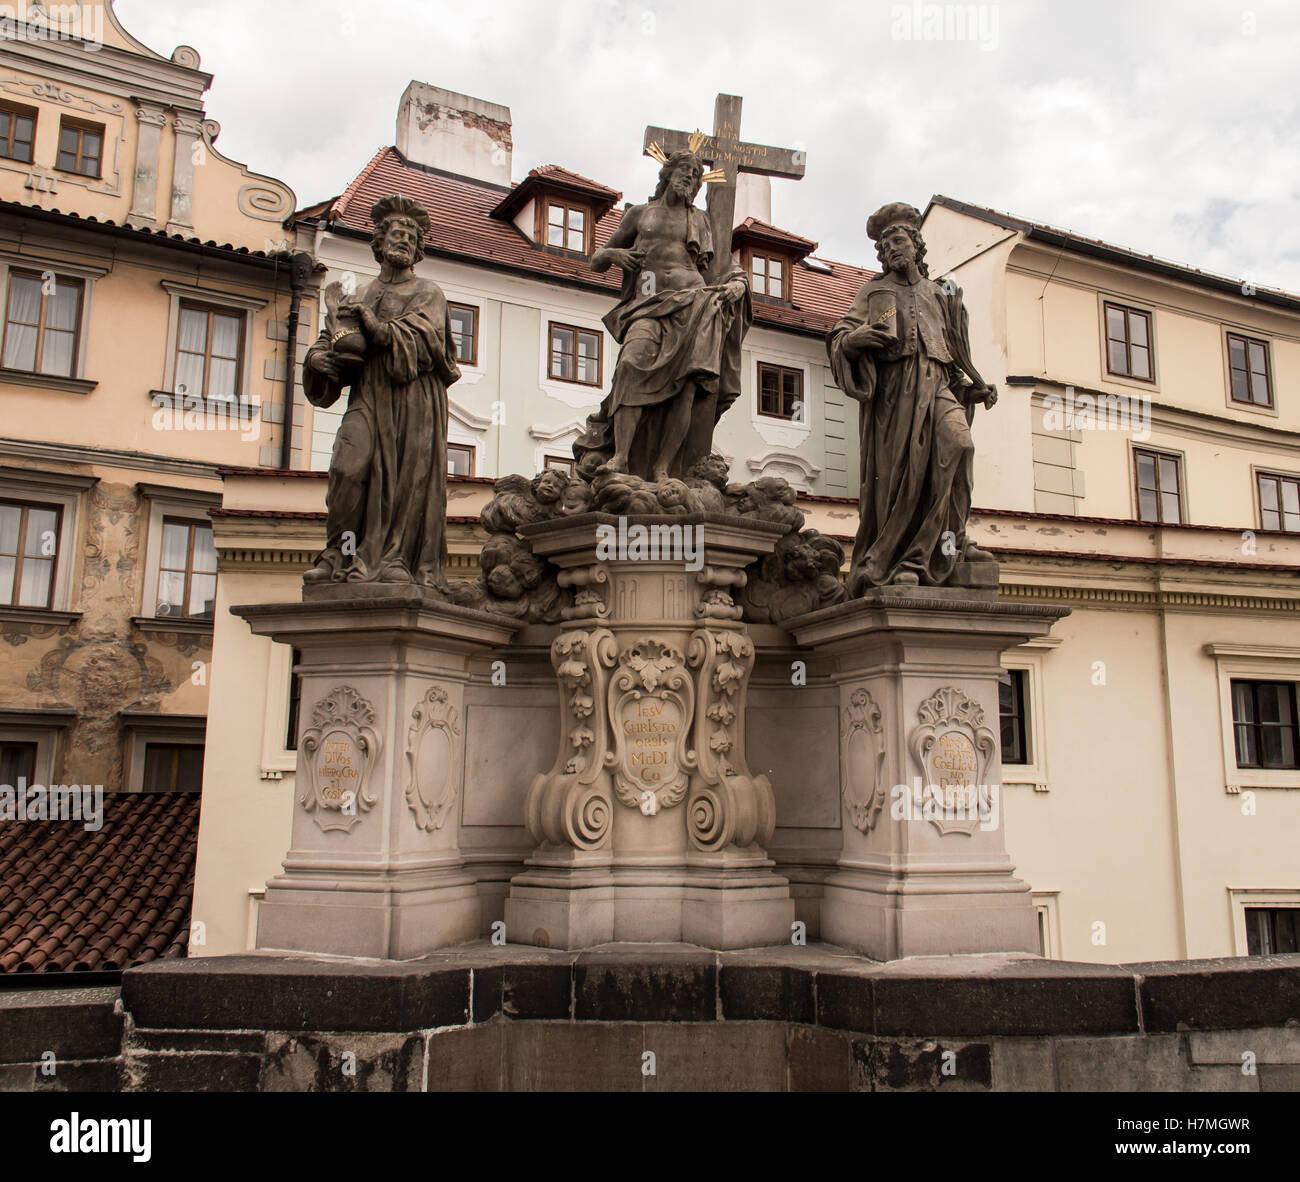 Statuary of Christ the Saviour with St. Cosmas and St. Damian. Statuary of Christ on the Charles Bridge leading - Stock Image